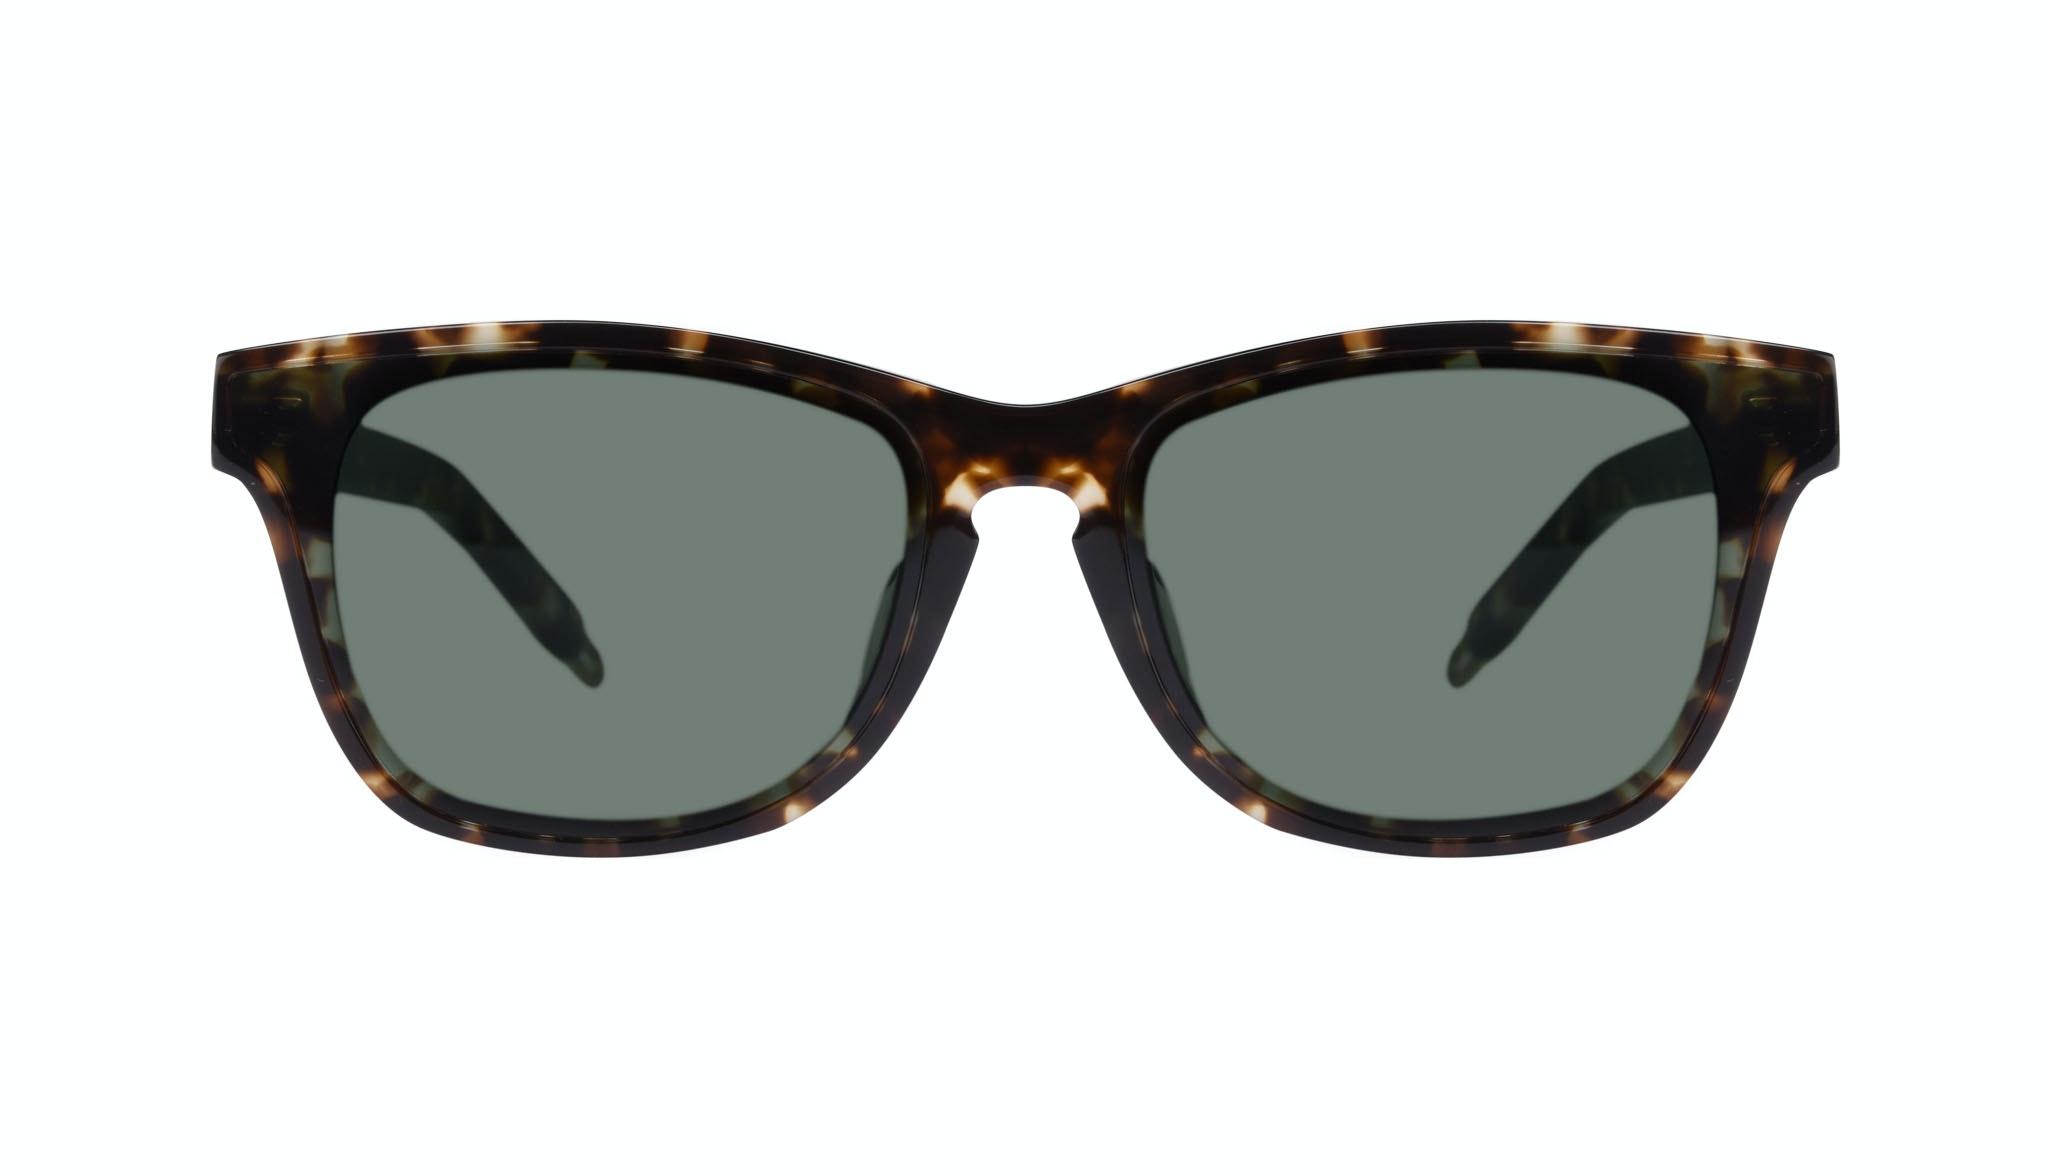 Affordable Fashion Glasses Square Sunglasses Men Commander Tortoise Front